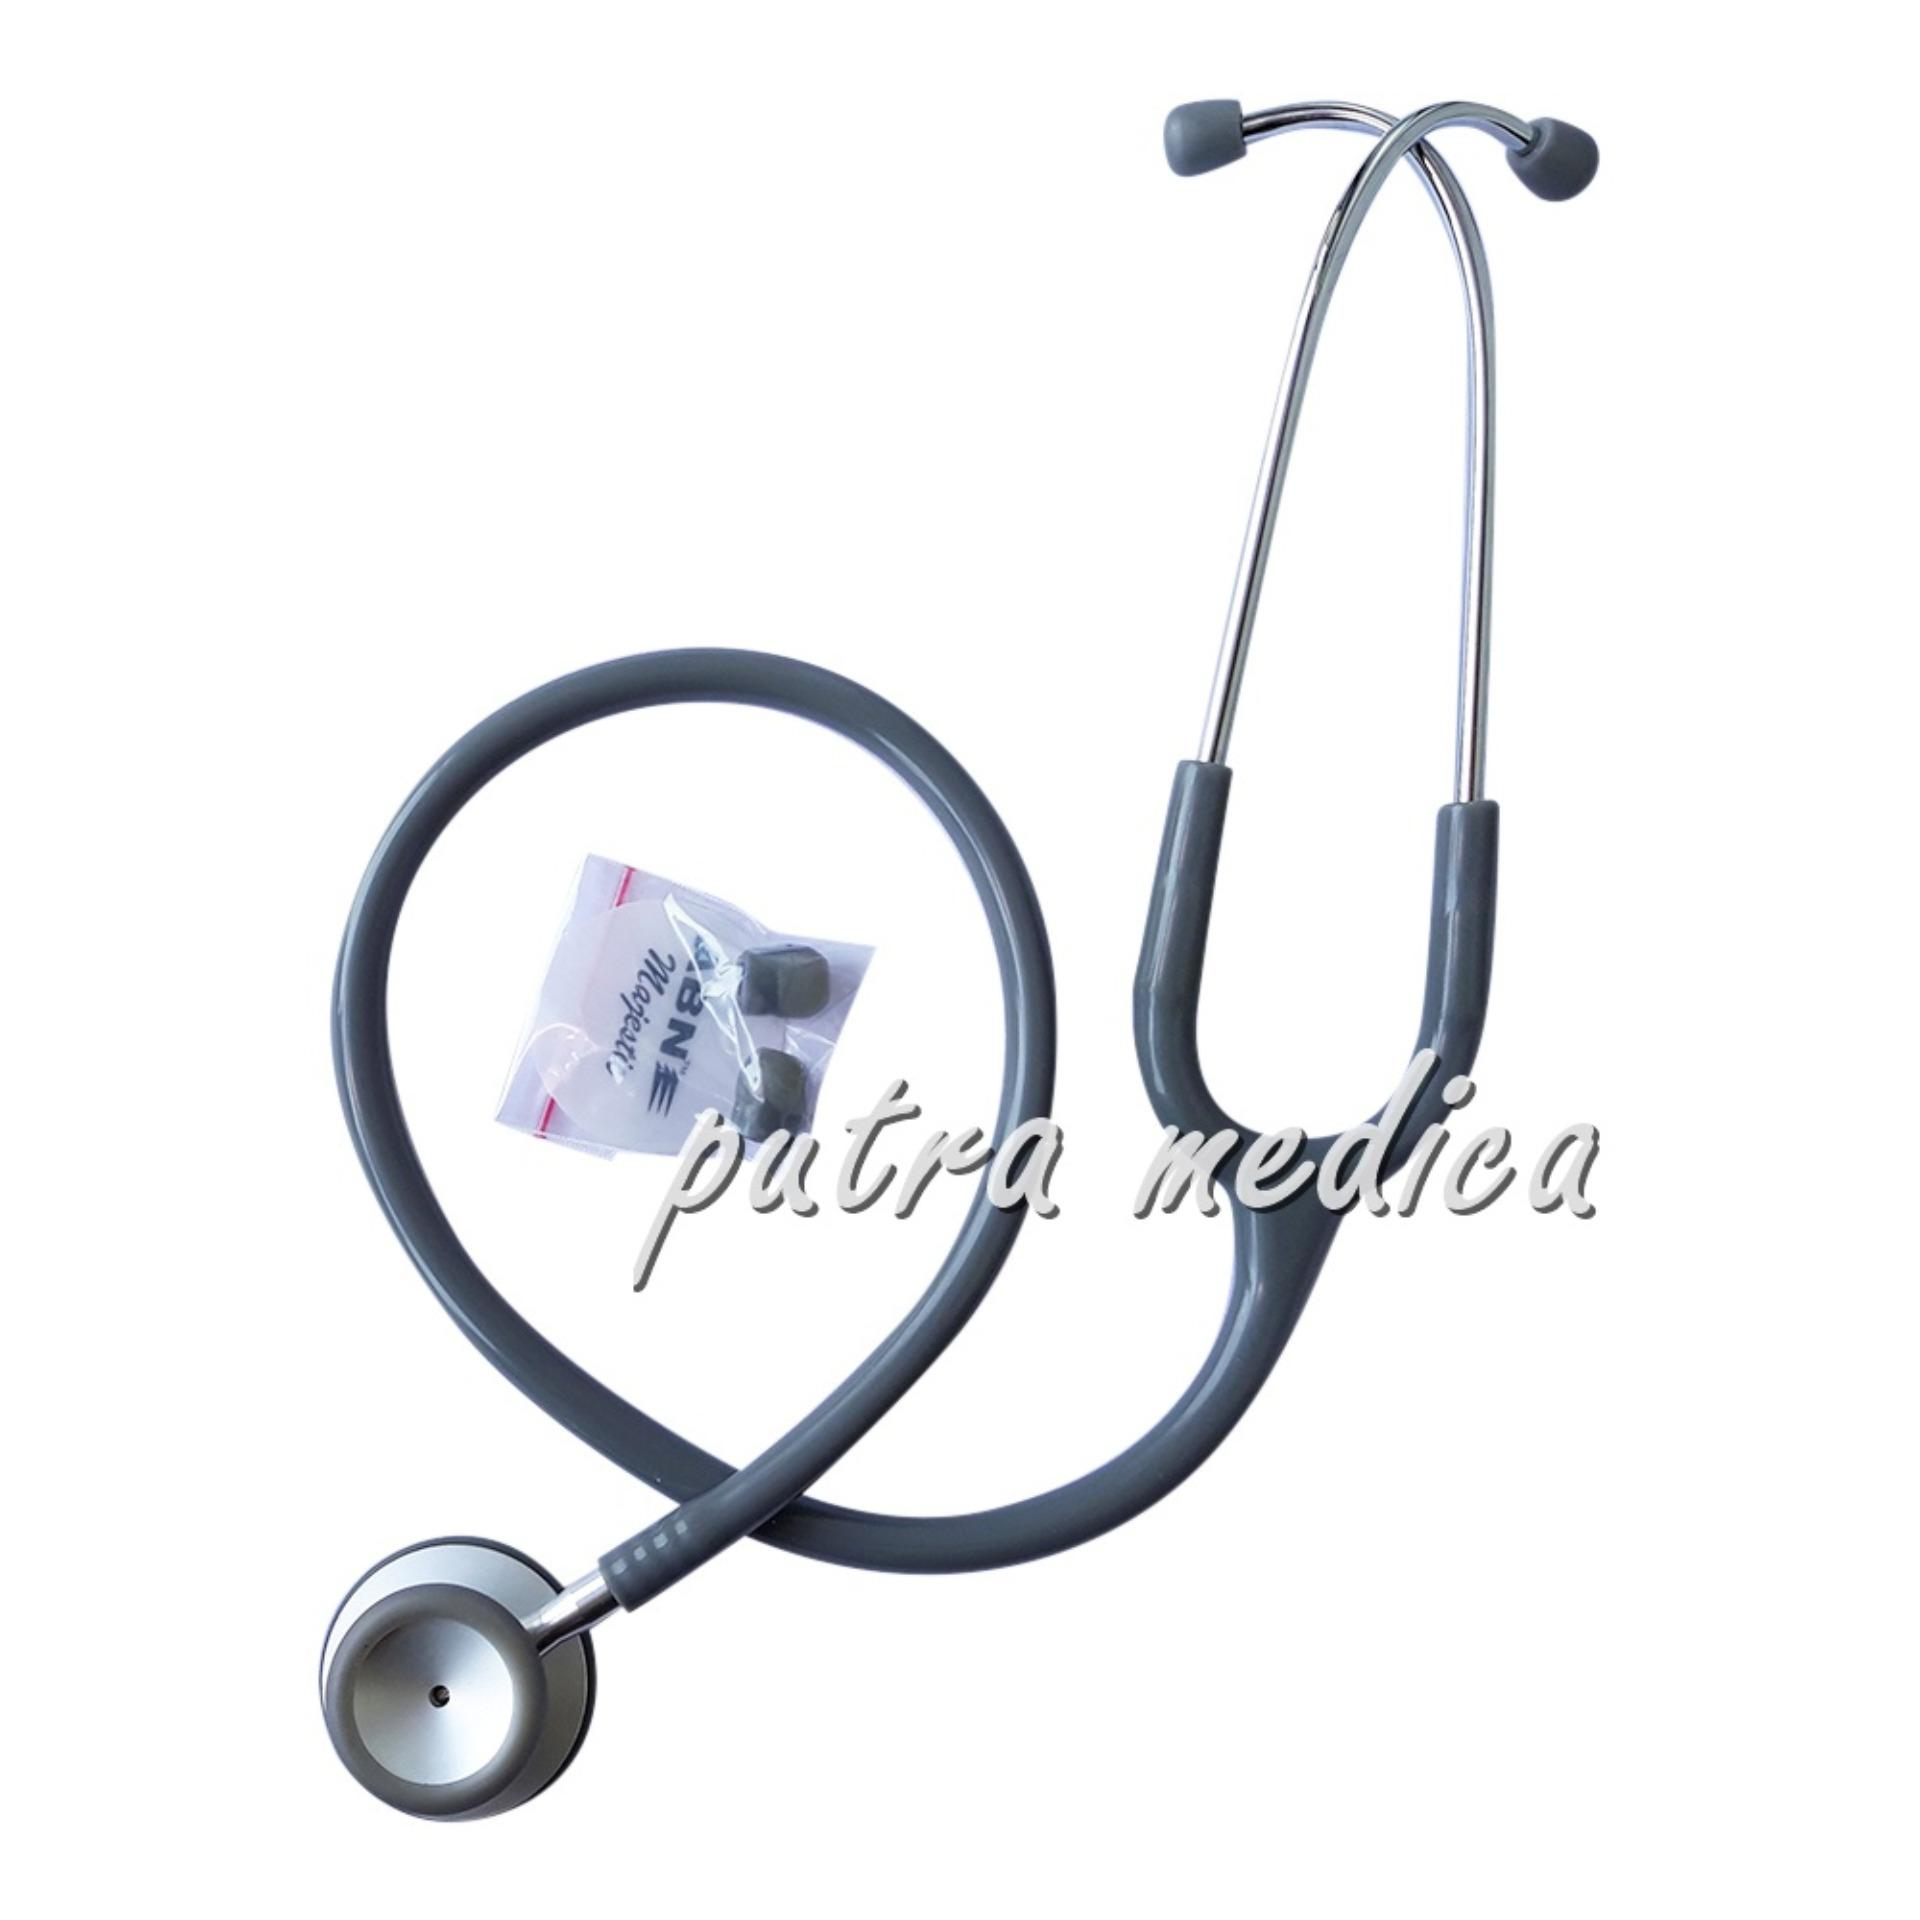 Putra Medica Abn Stetoskop Majestic Grey Alat Kedokteran Putra Medica Diskon 40